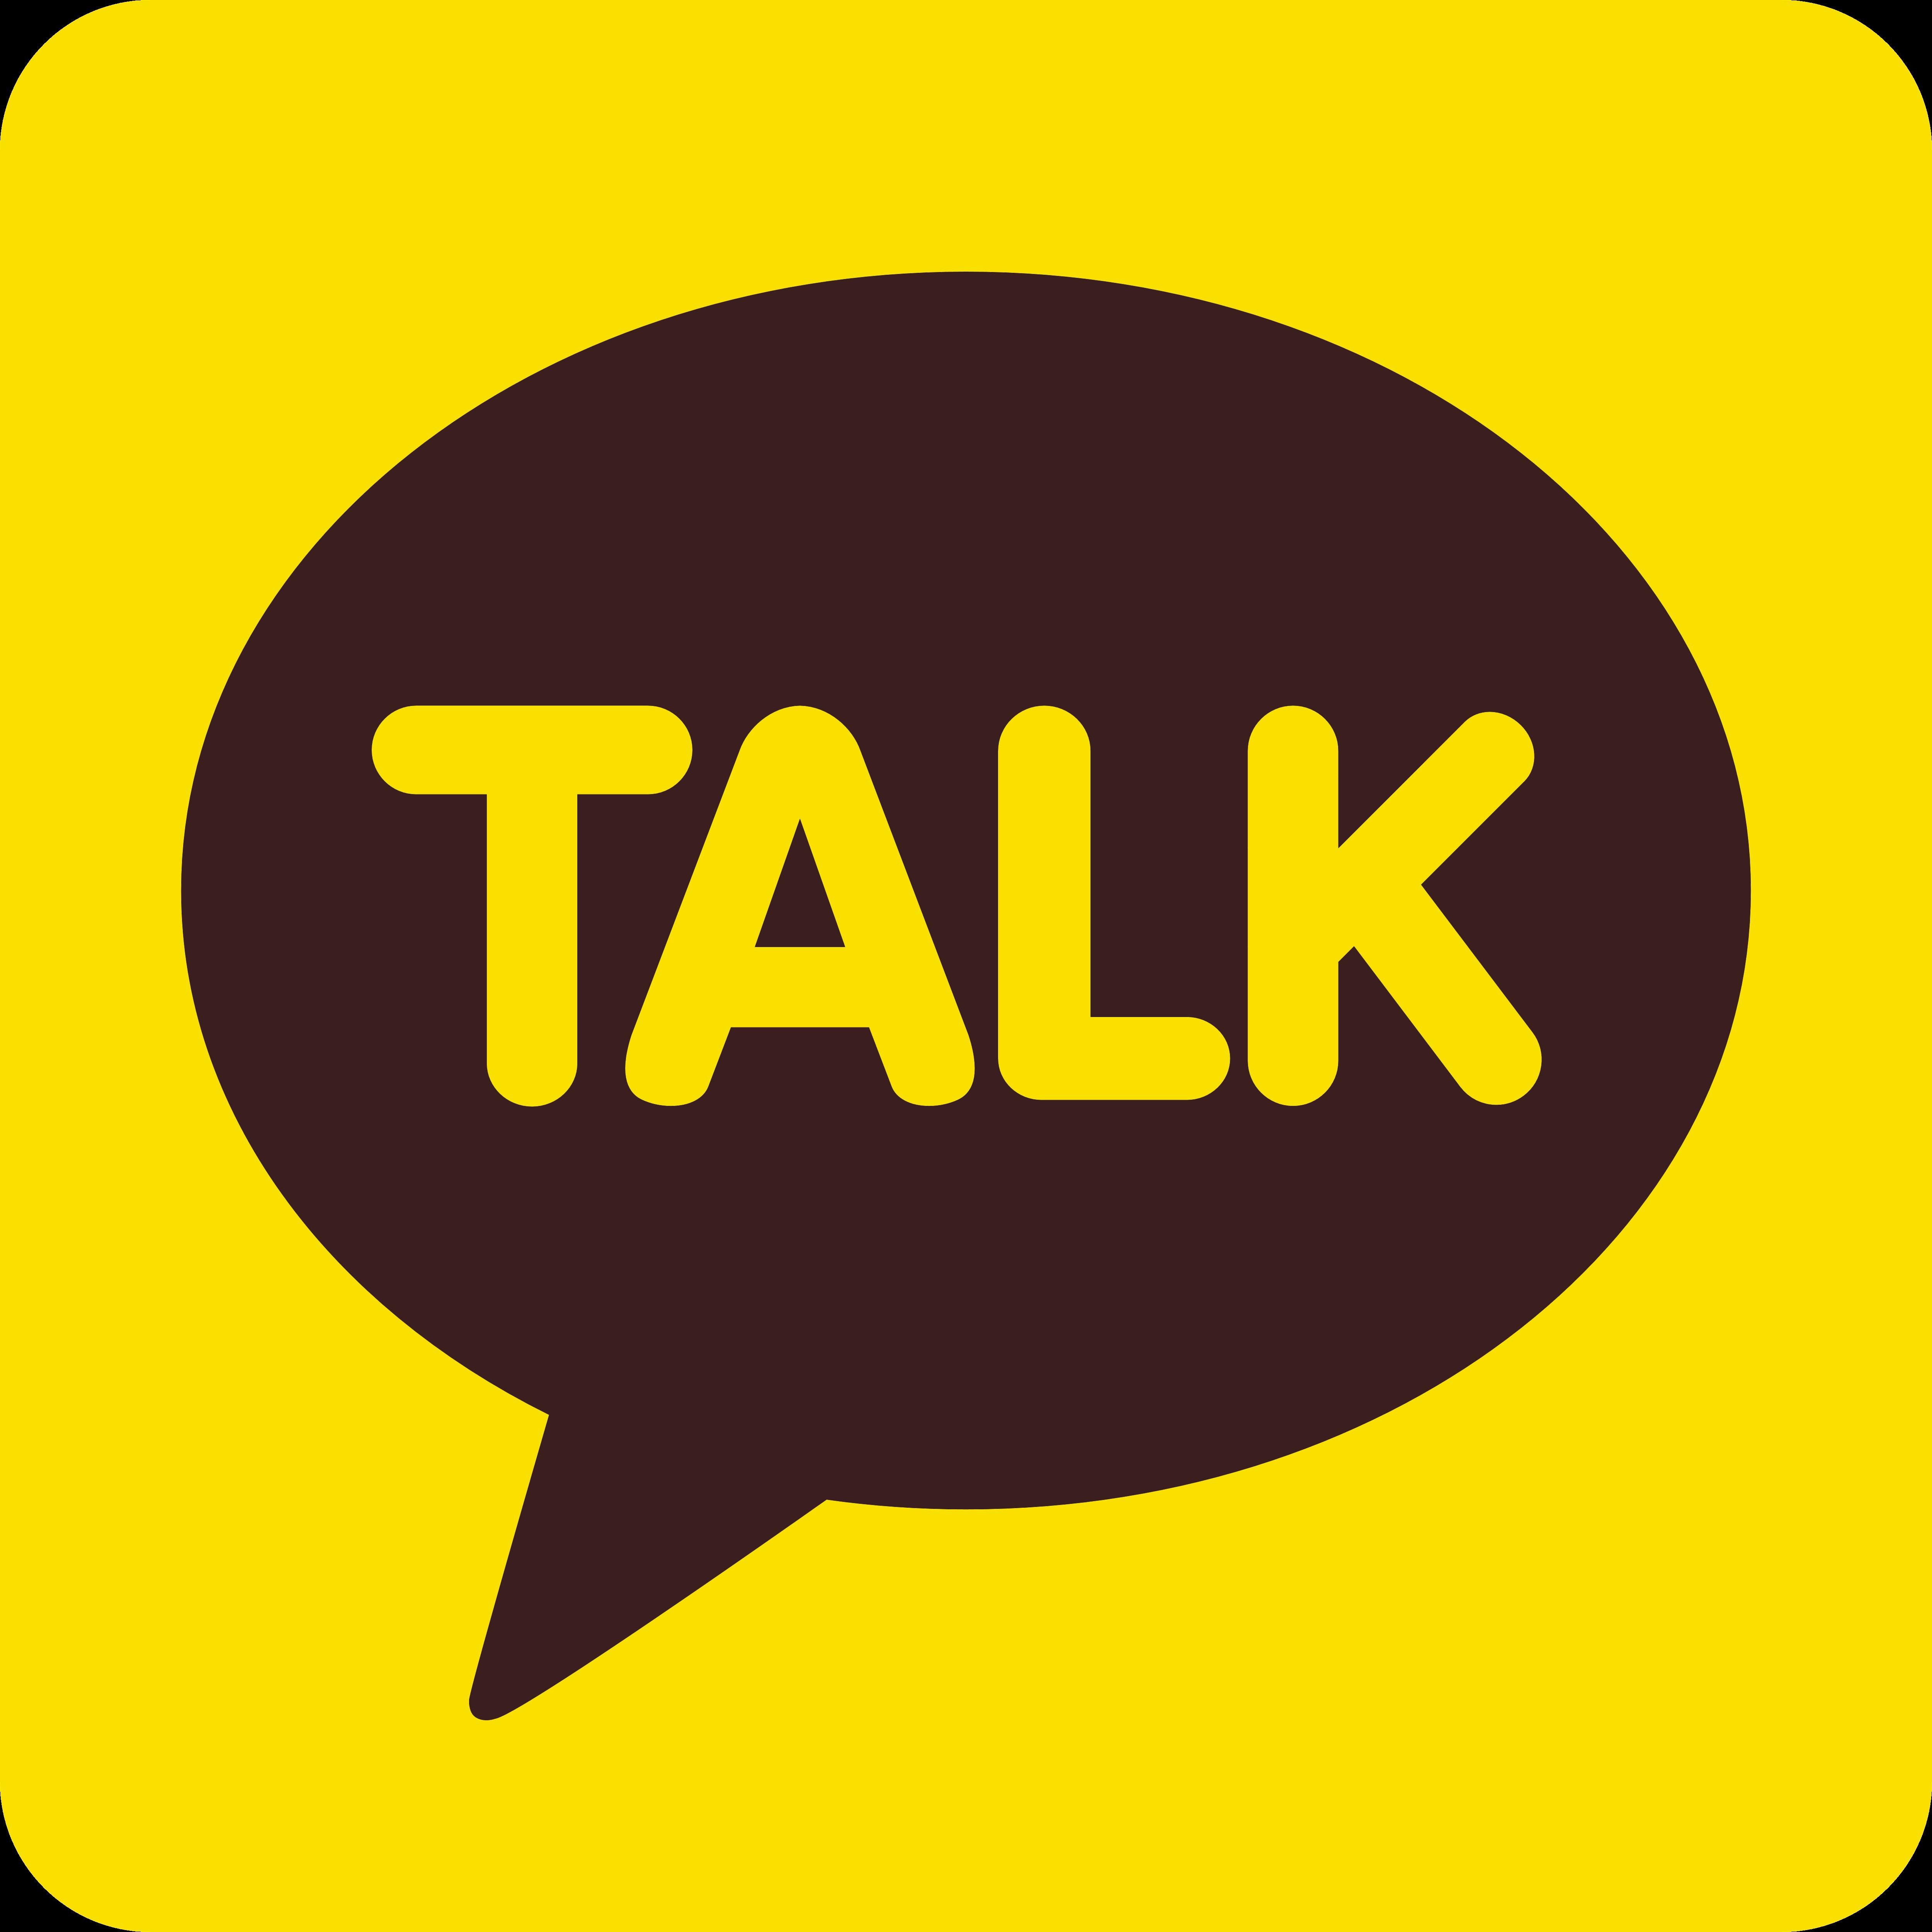 Kakaotalk Logo (Kakao Talk) - Kakao, Transparent background PNG HD thumbnail